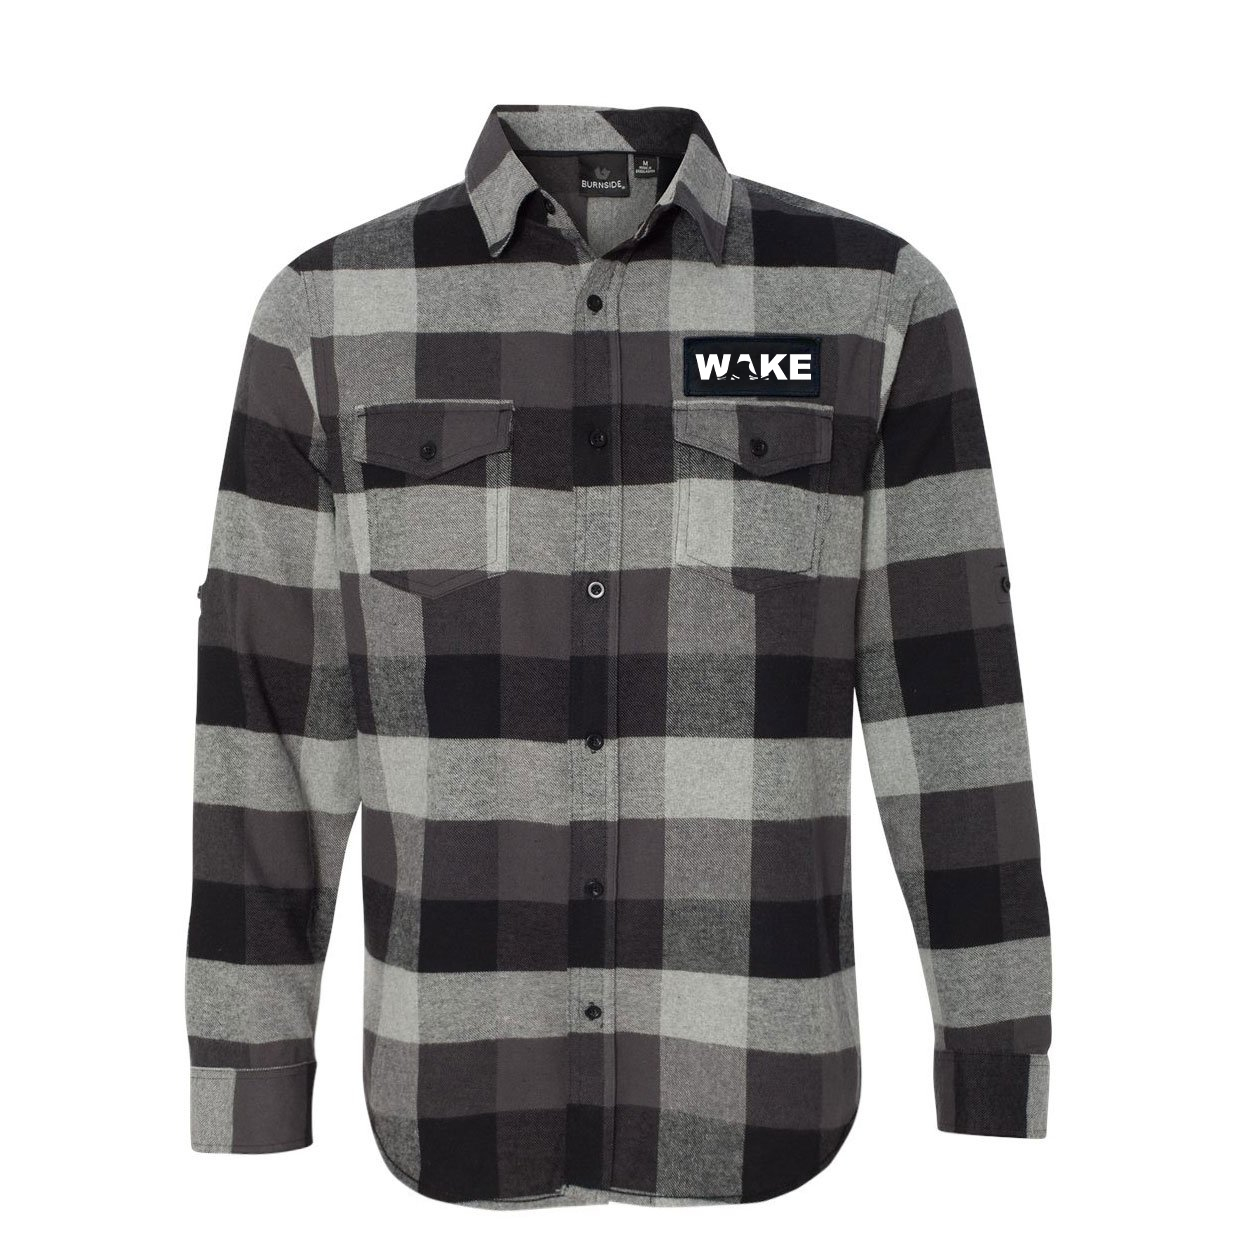 Wake Wave Logo Classic Unisex Long Sleeve Woven Patch Flannel Shirt Black/Gray (White Logo)